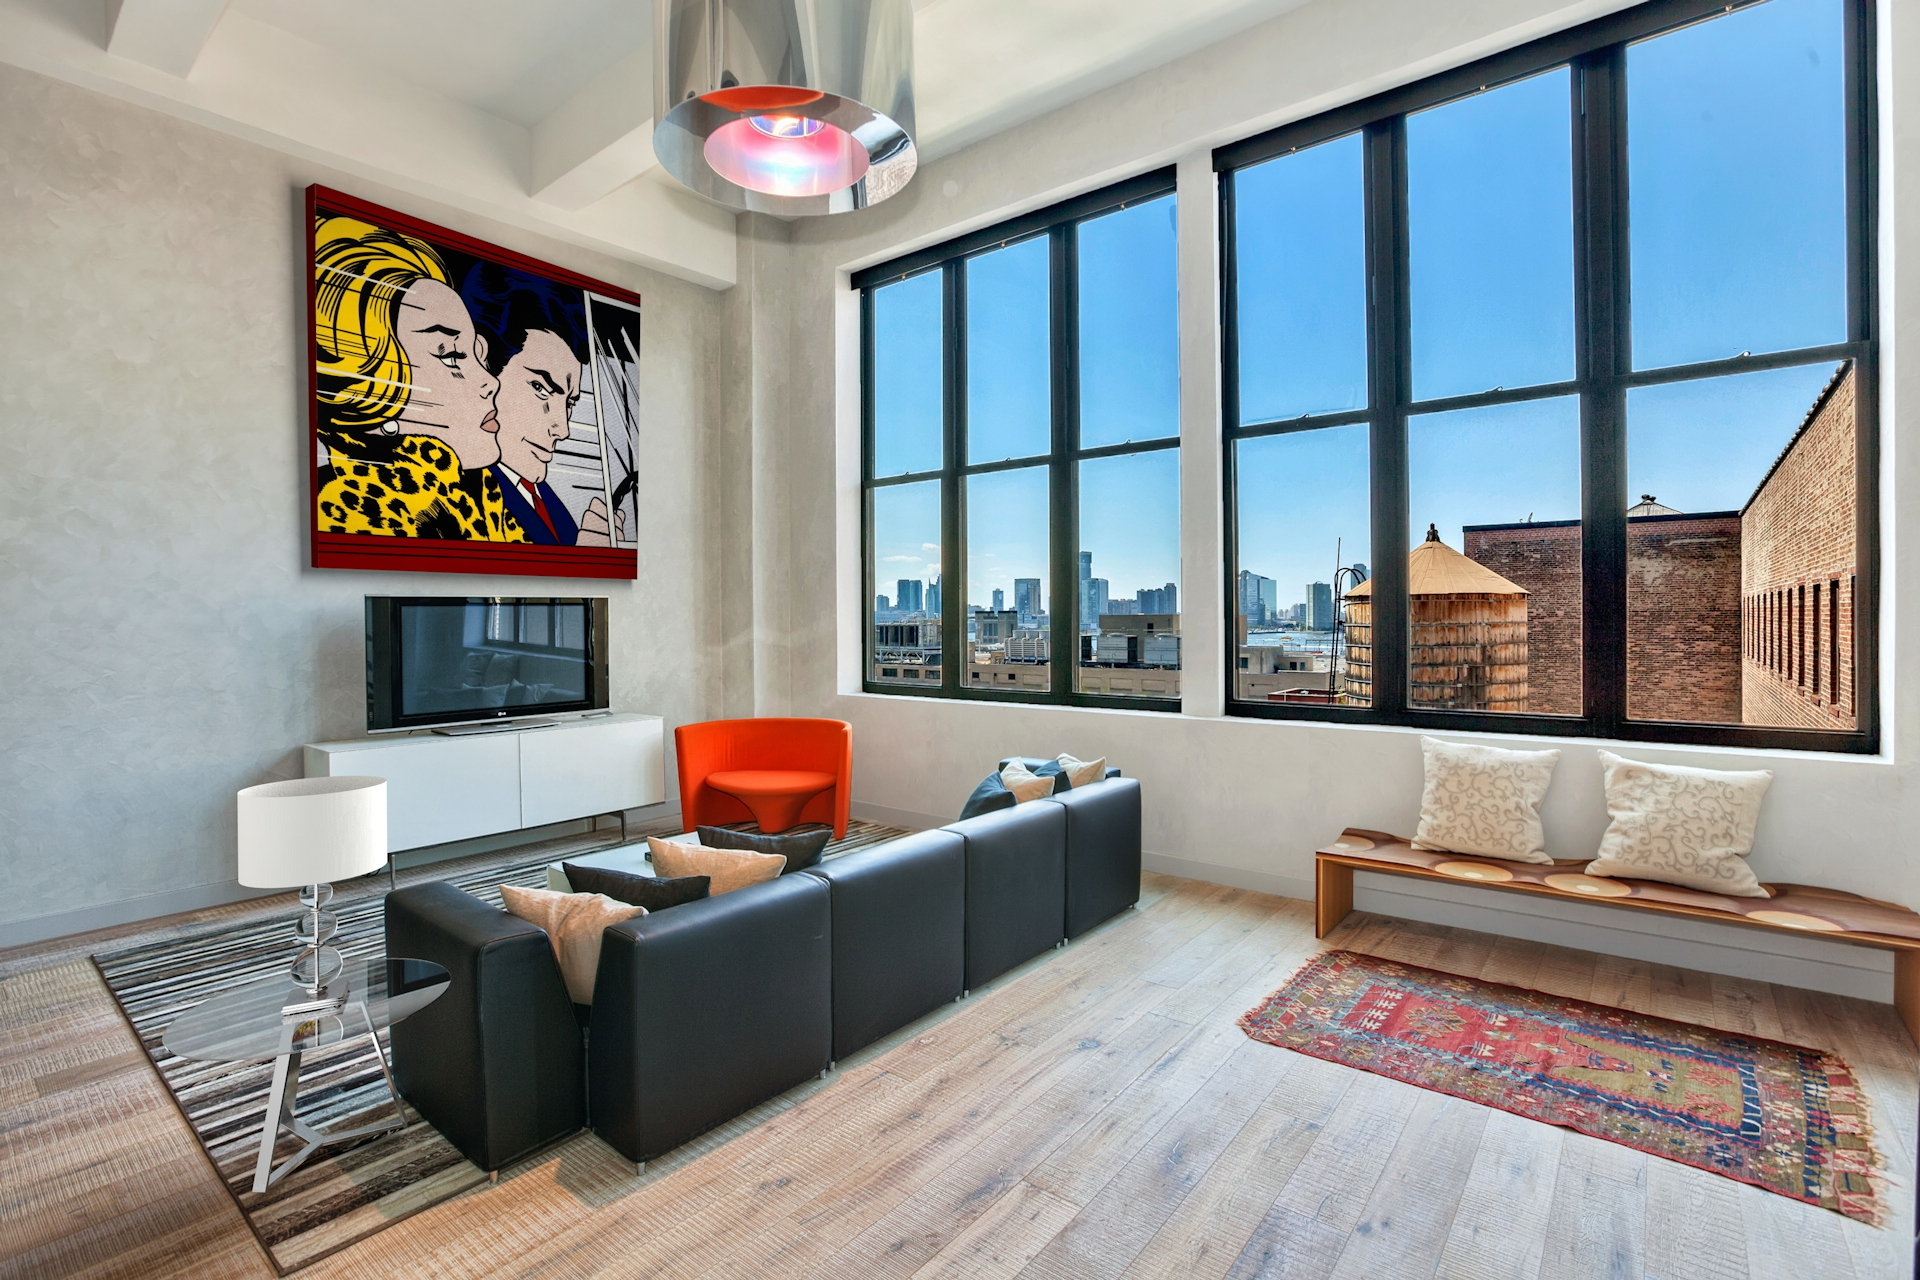 421 Hudson Street #719 - $4,250,000